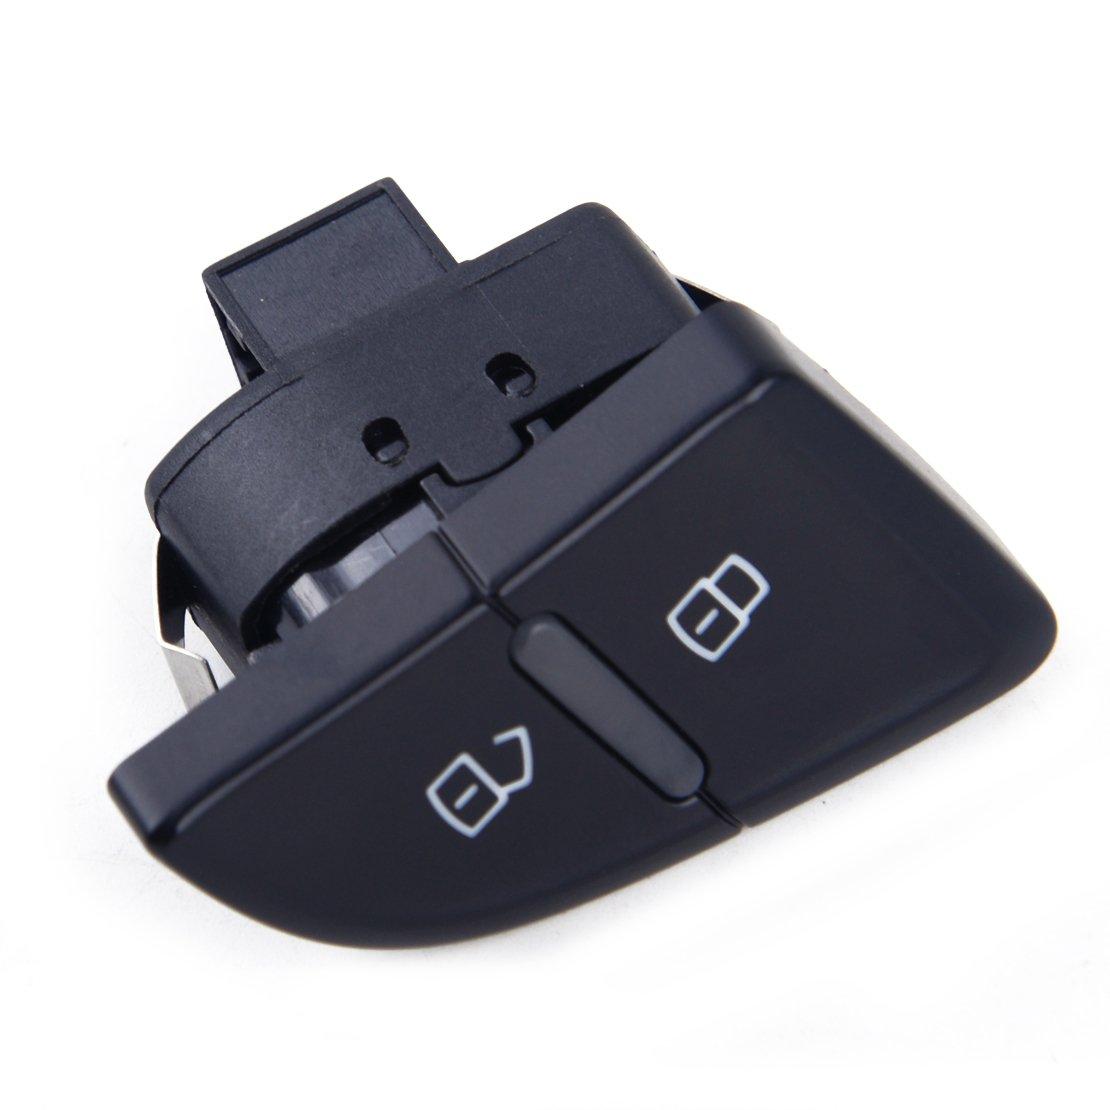 CITALL Interrupteur de Commande de Verrouillage de Porte Avant 8K1962107 Fit pour Audi A4 S4 A5 C/ôt/é Conducteur Gauche